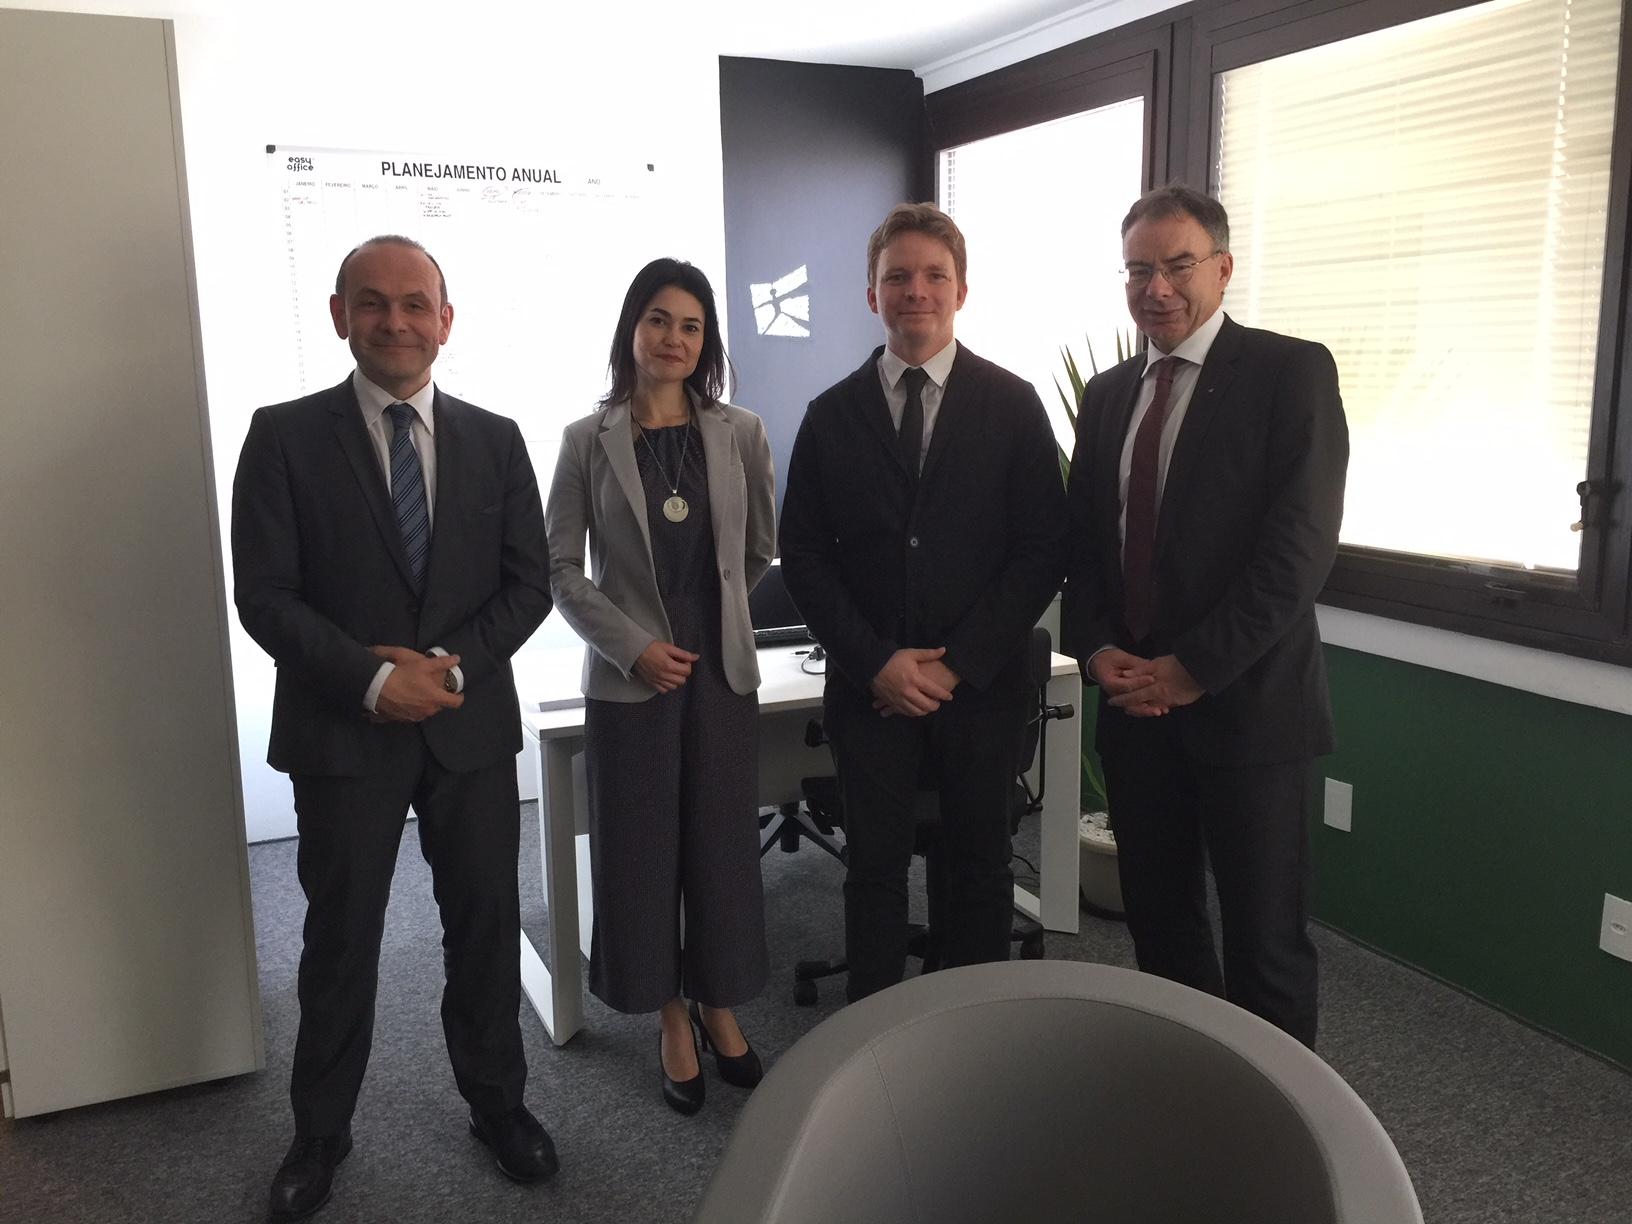 Visit Prof Bieger and Ambassador Mauruzzi